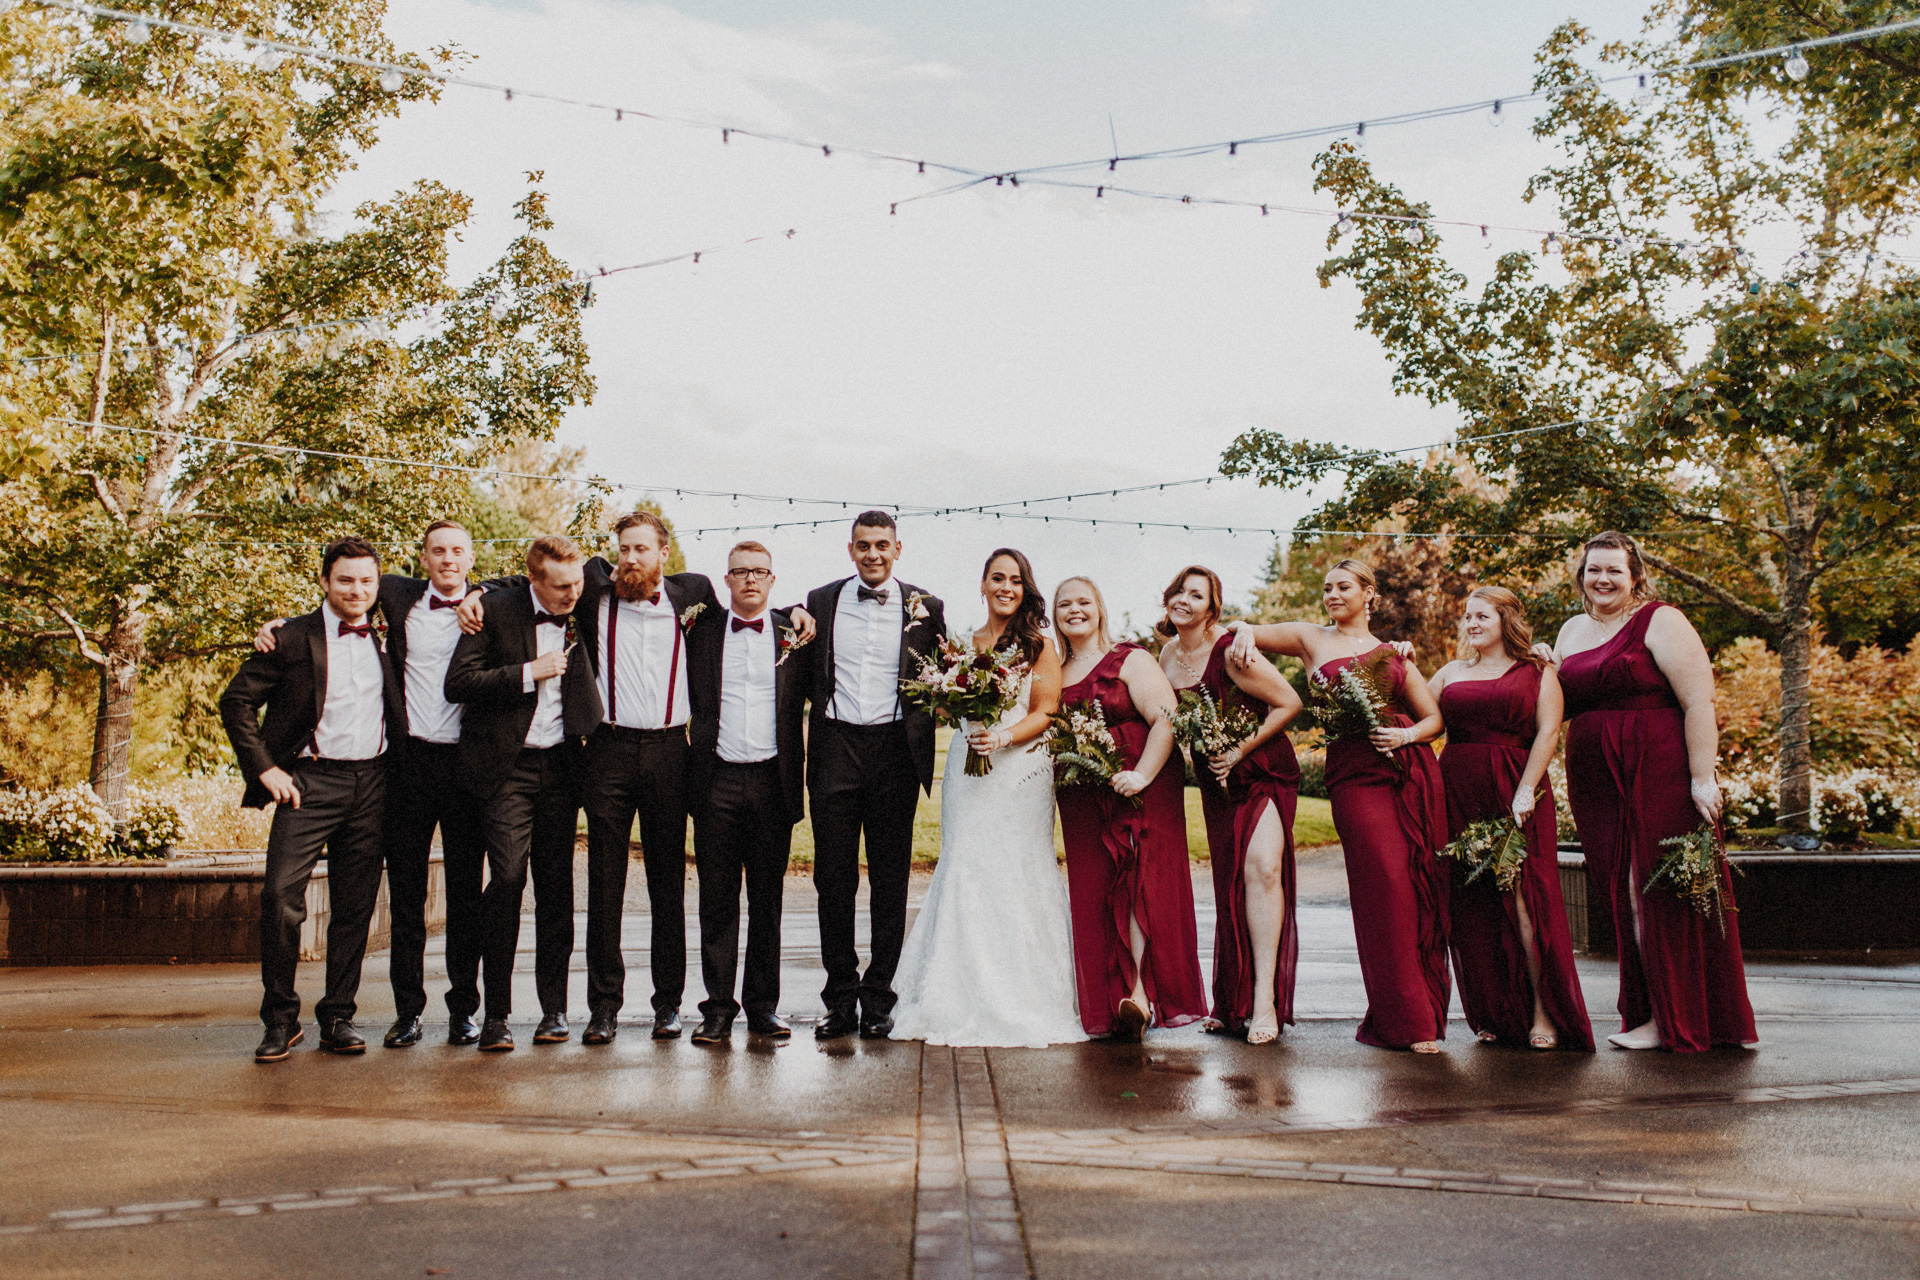 The bridal party at the Oregon Garden Resort Wedding